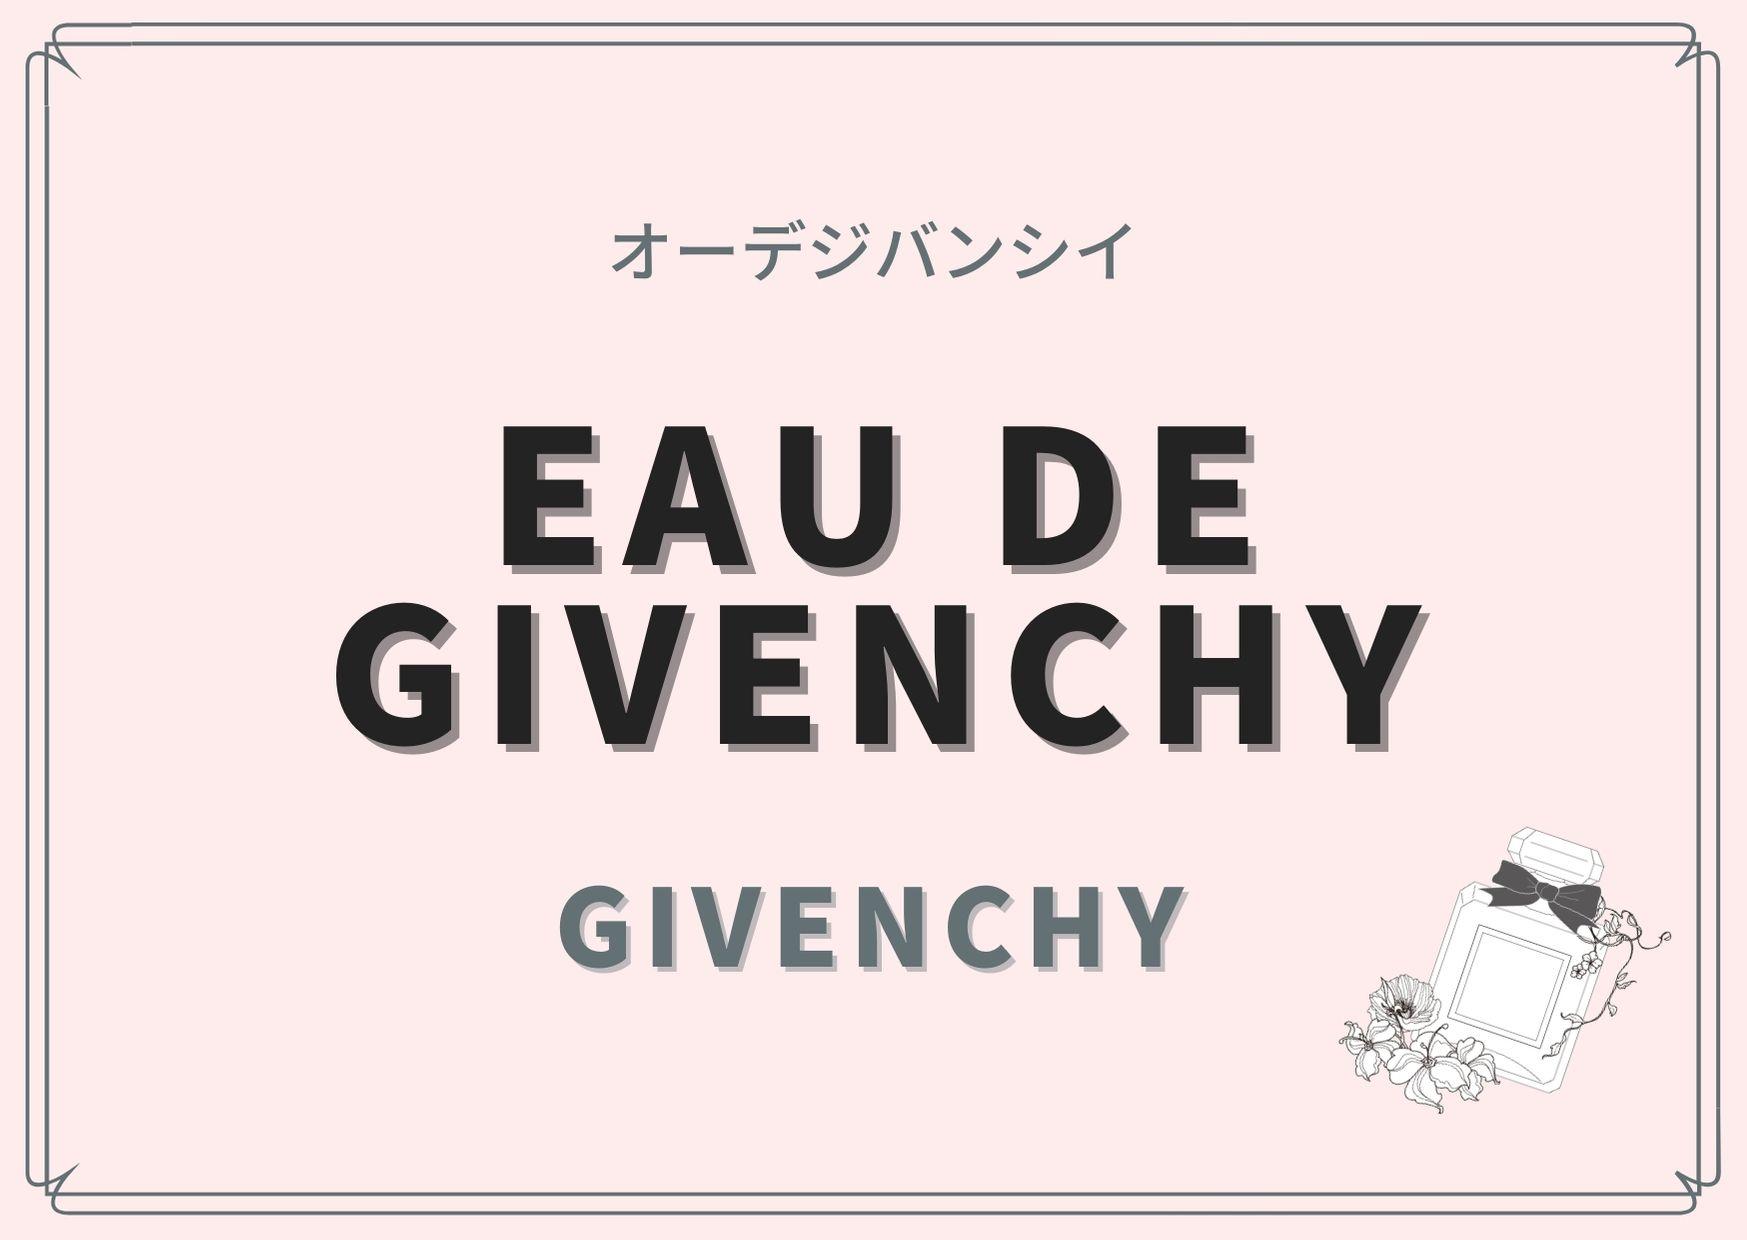 EAU DE GIVENCHY(オーデジバンシイ)/GIVENCHY(ジバンシィ)